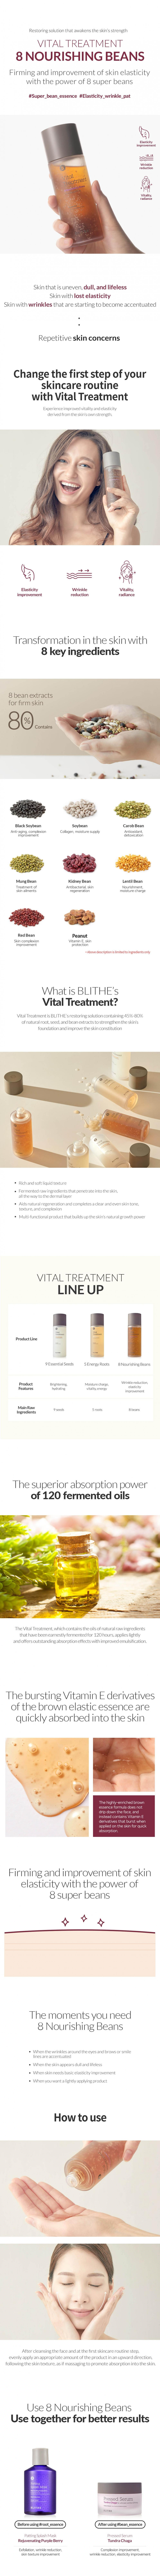 [Blithe] Vital Treatment 8 Nourishing Beans 150ml